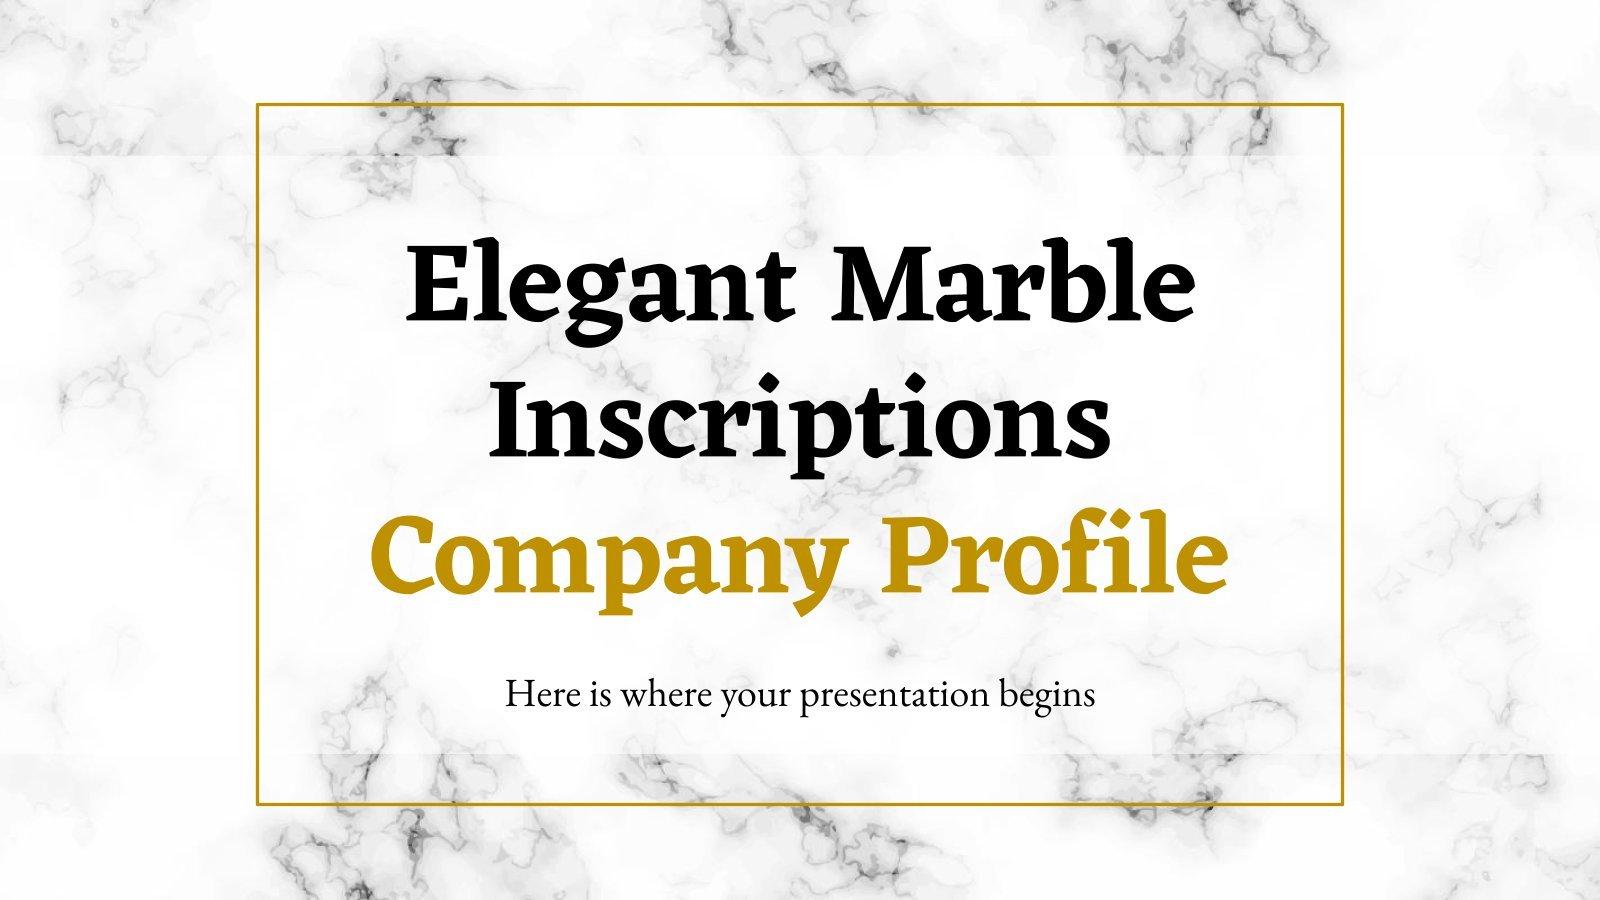 Elegant Marble Inscriptions Company Profile presentation template